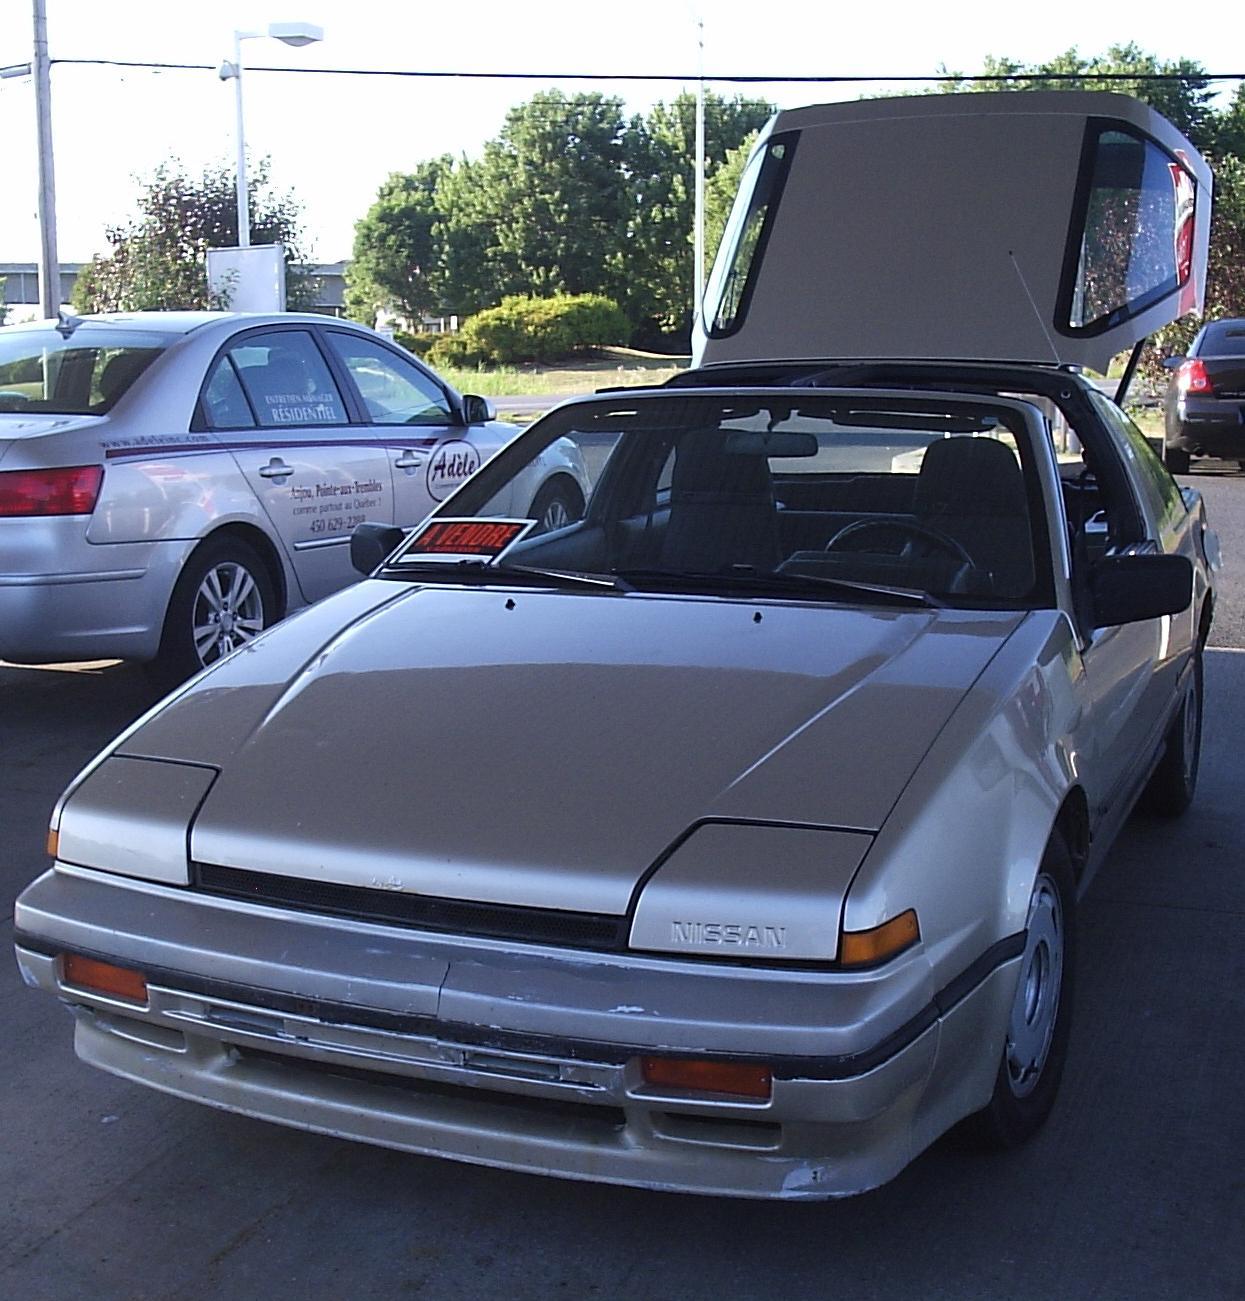 Tuned_Nissan_Pulsar_NX_N13.jpg